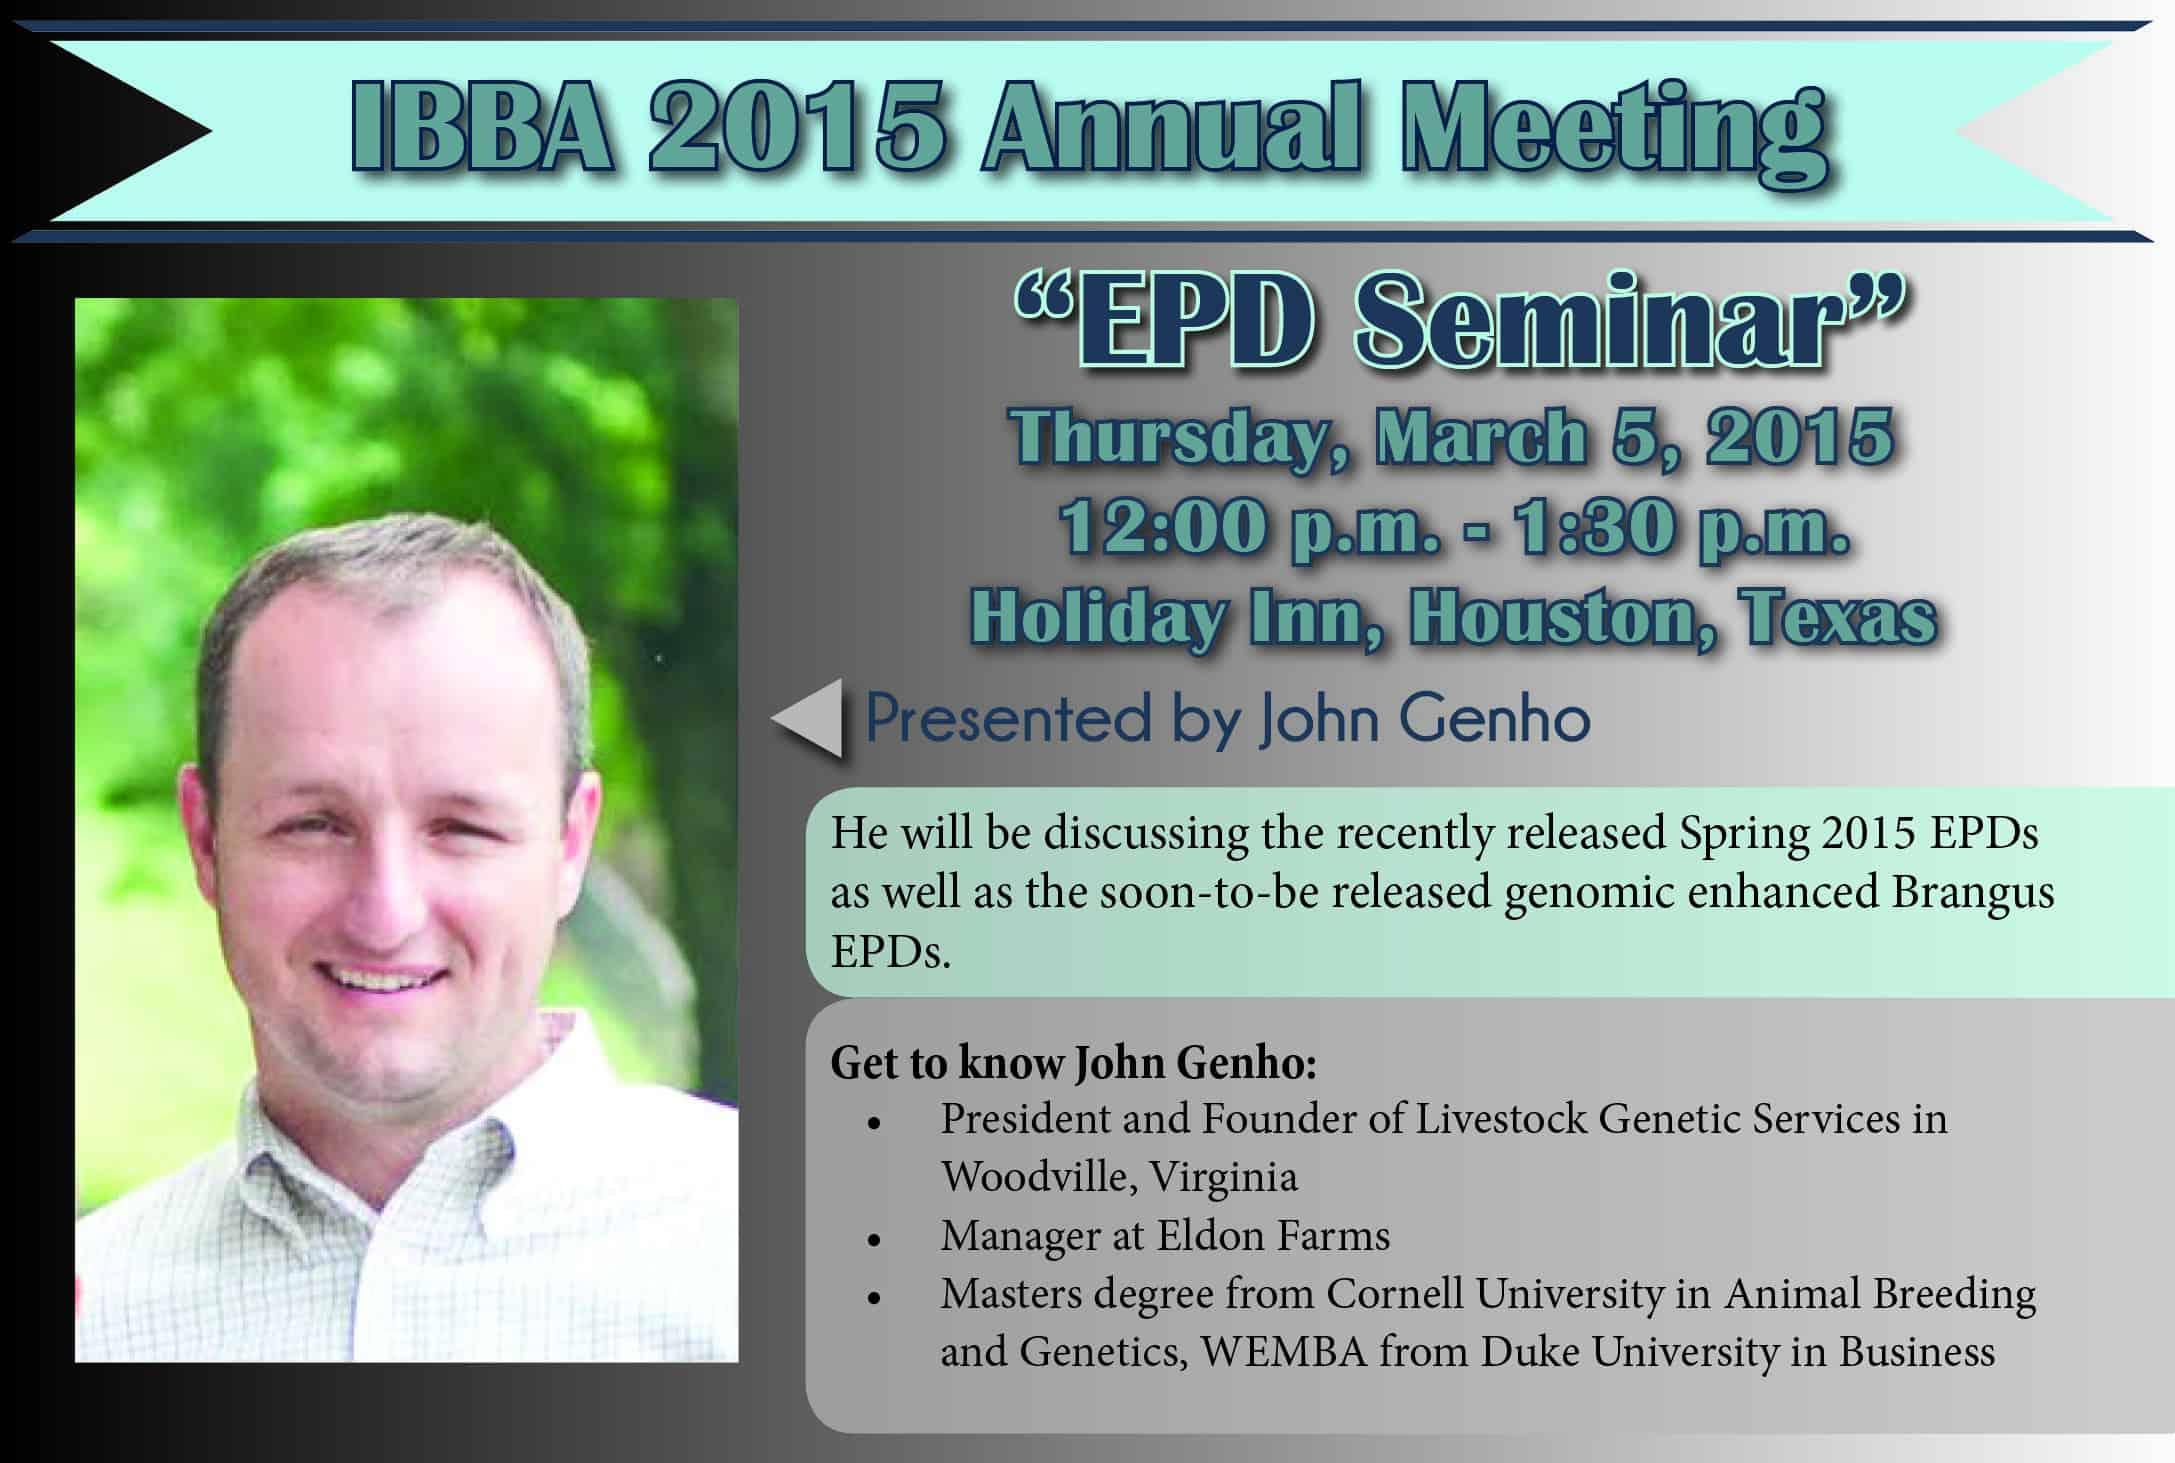 2015 EPD Seminar